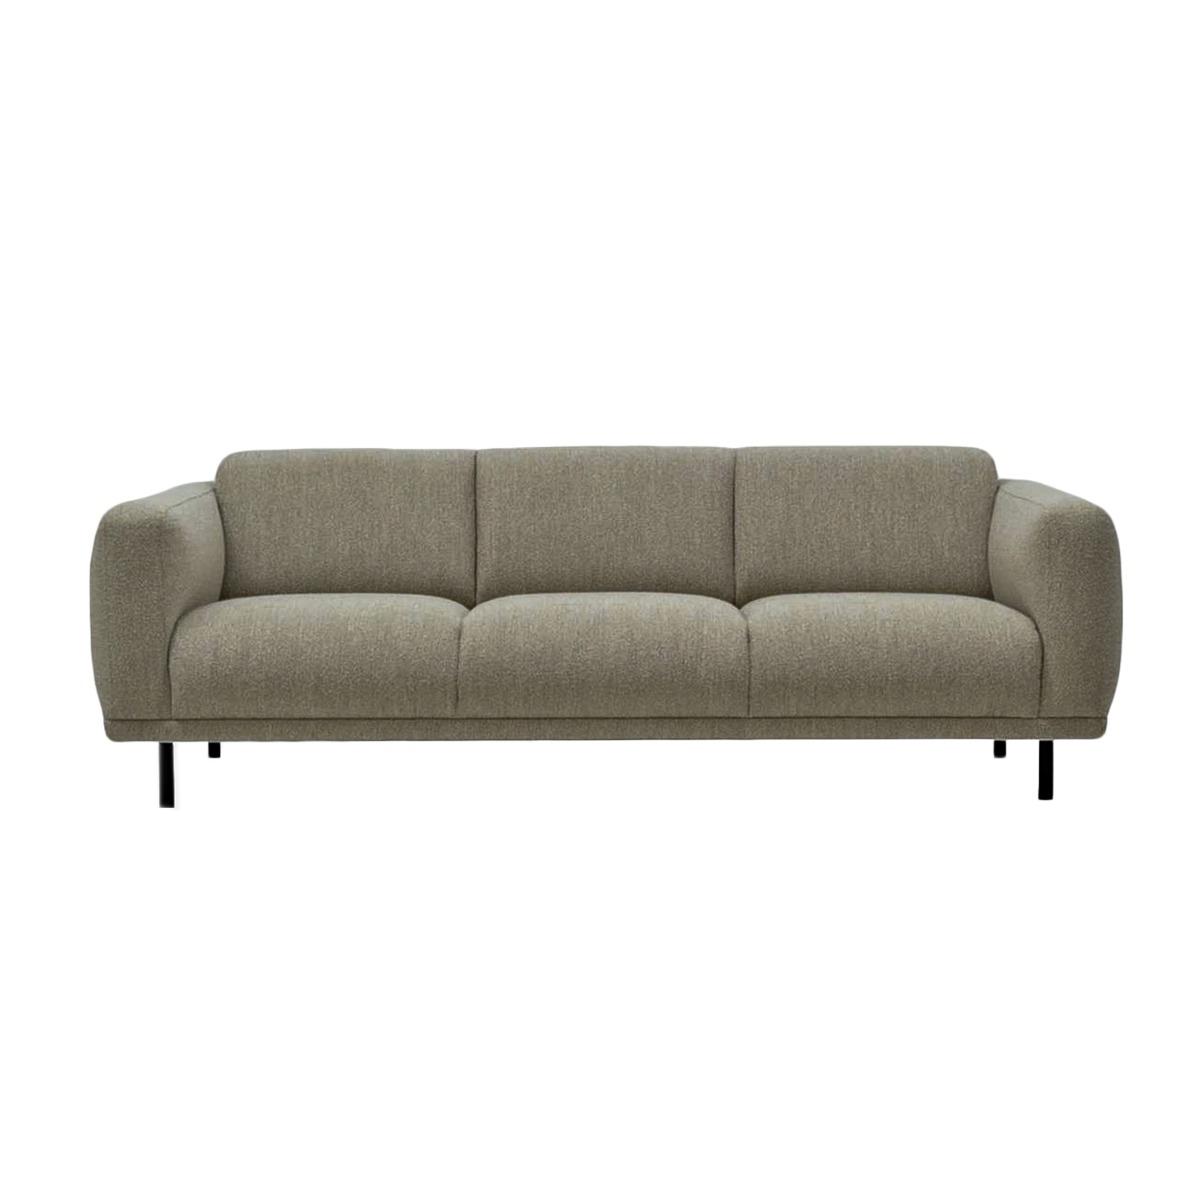 Teddy sofa XL Pols Potten - Olijf Groen